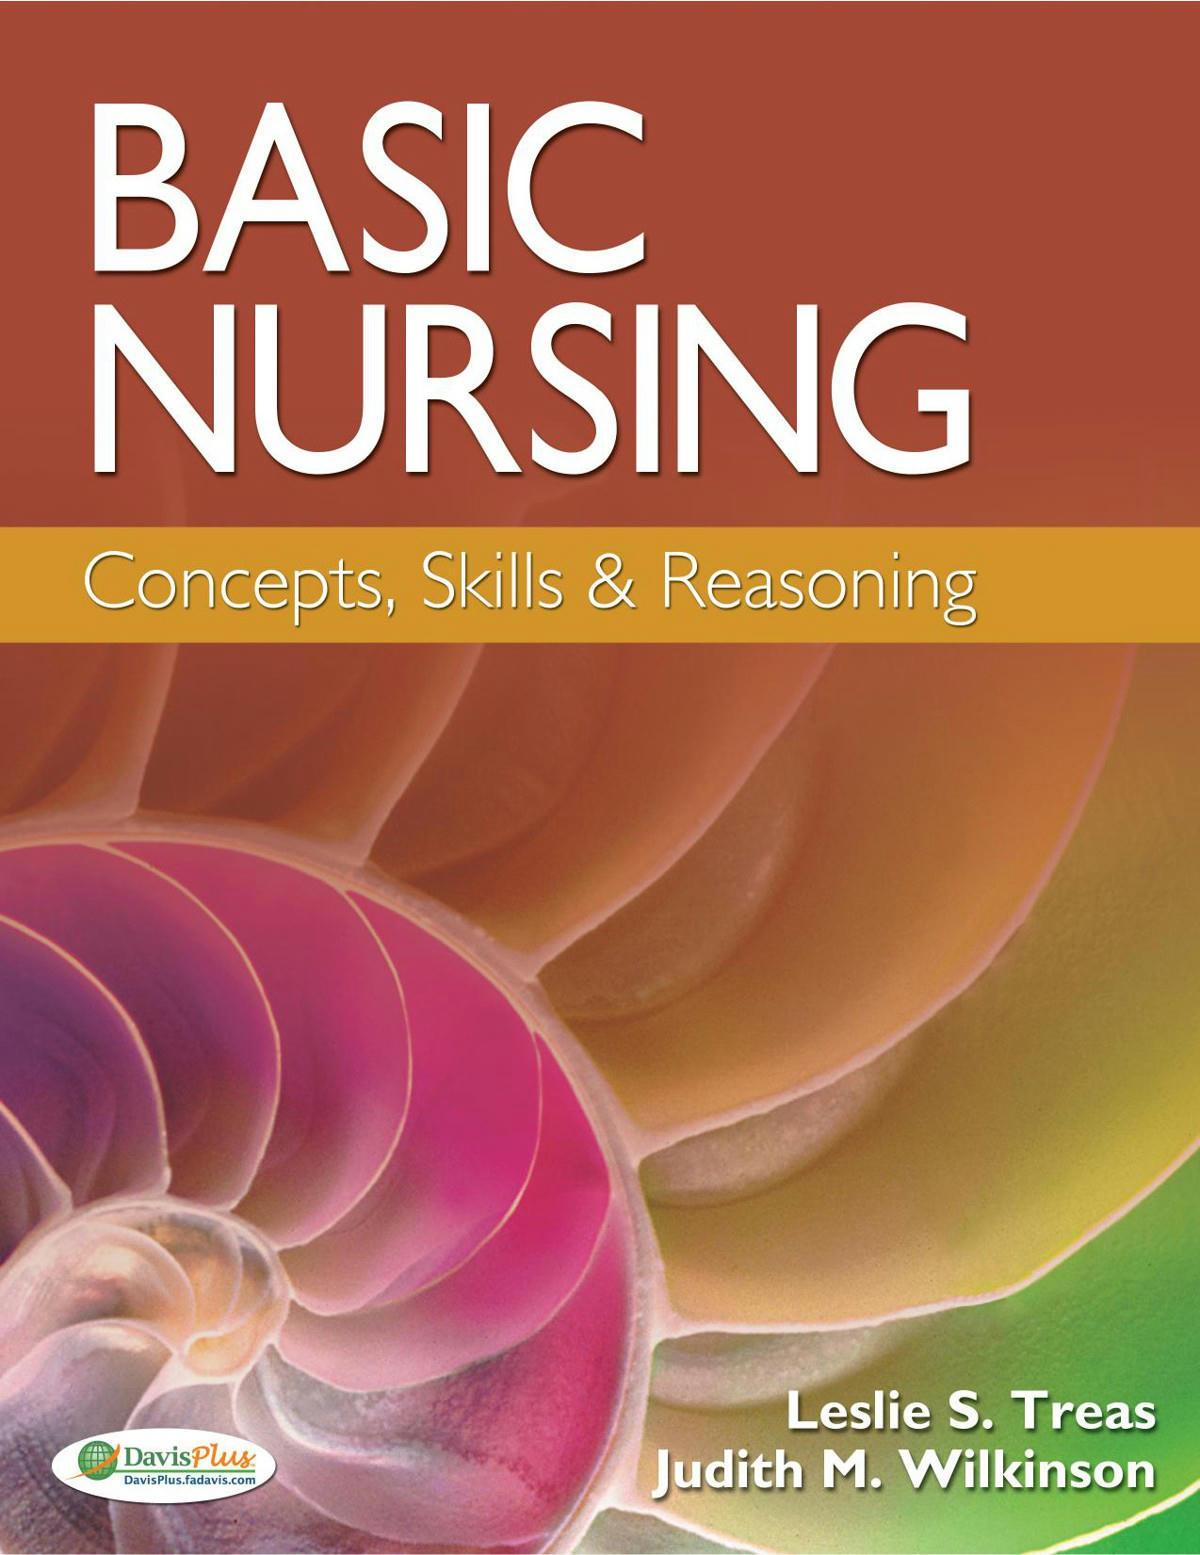 [LIVRE] Basic Nursing : concepts, skills, and reasoning Ukz88mw2ewcmh4rzg